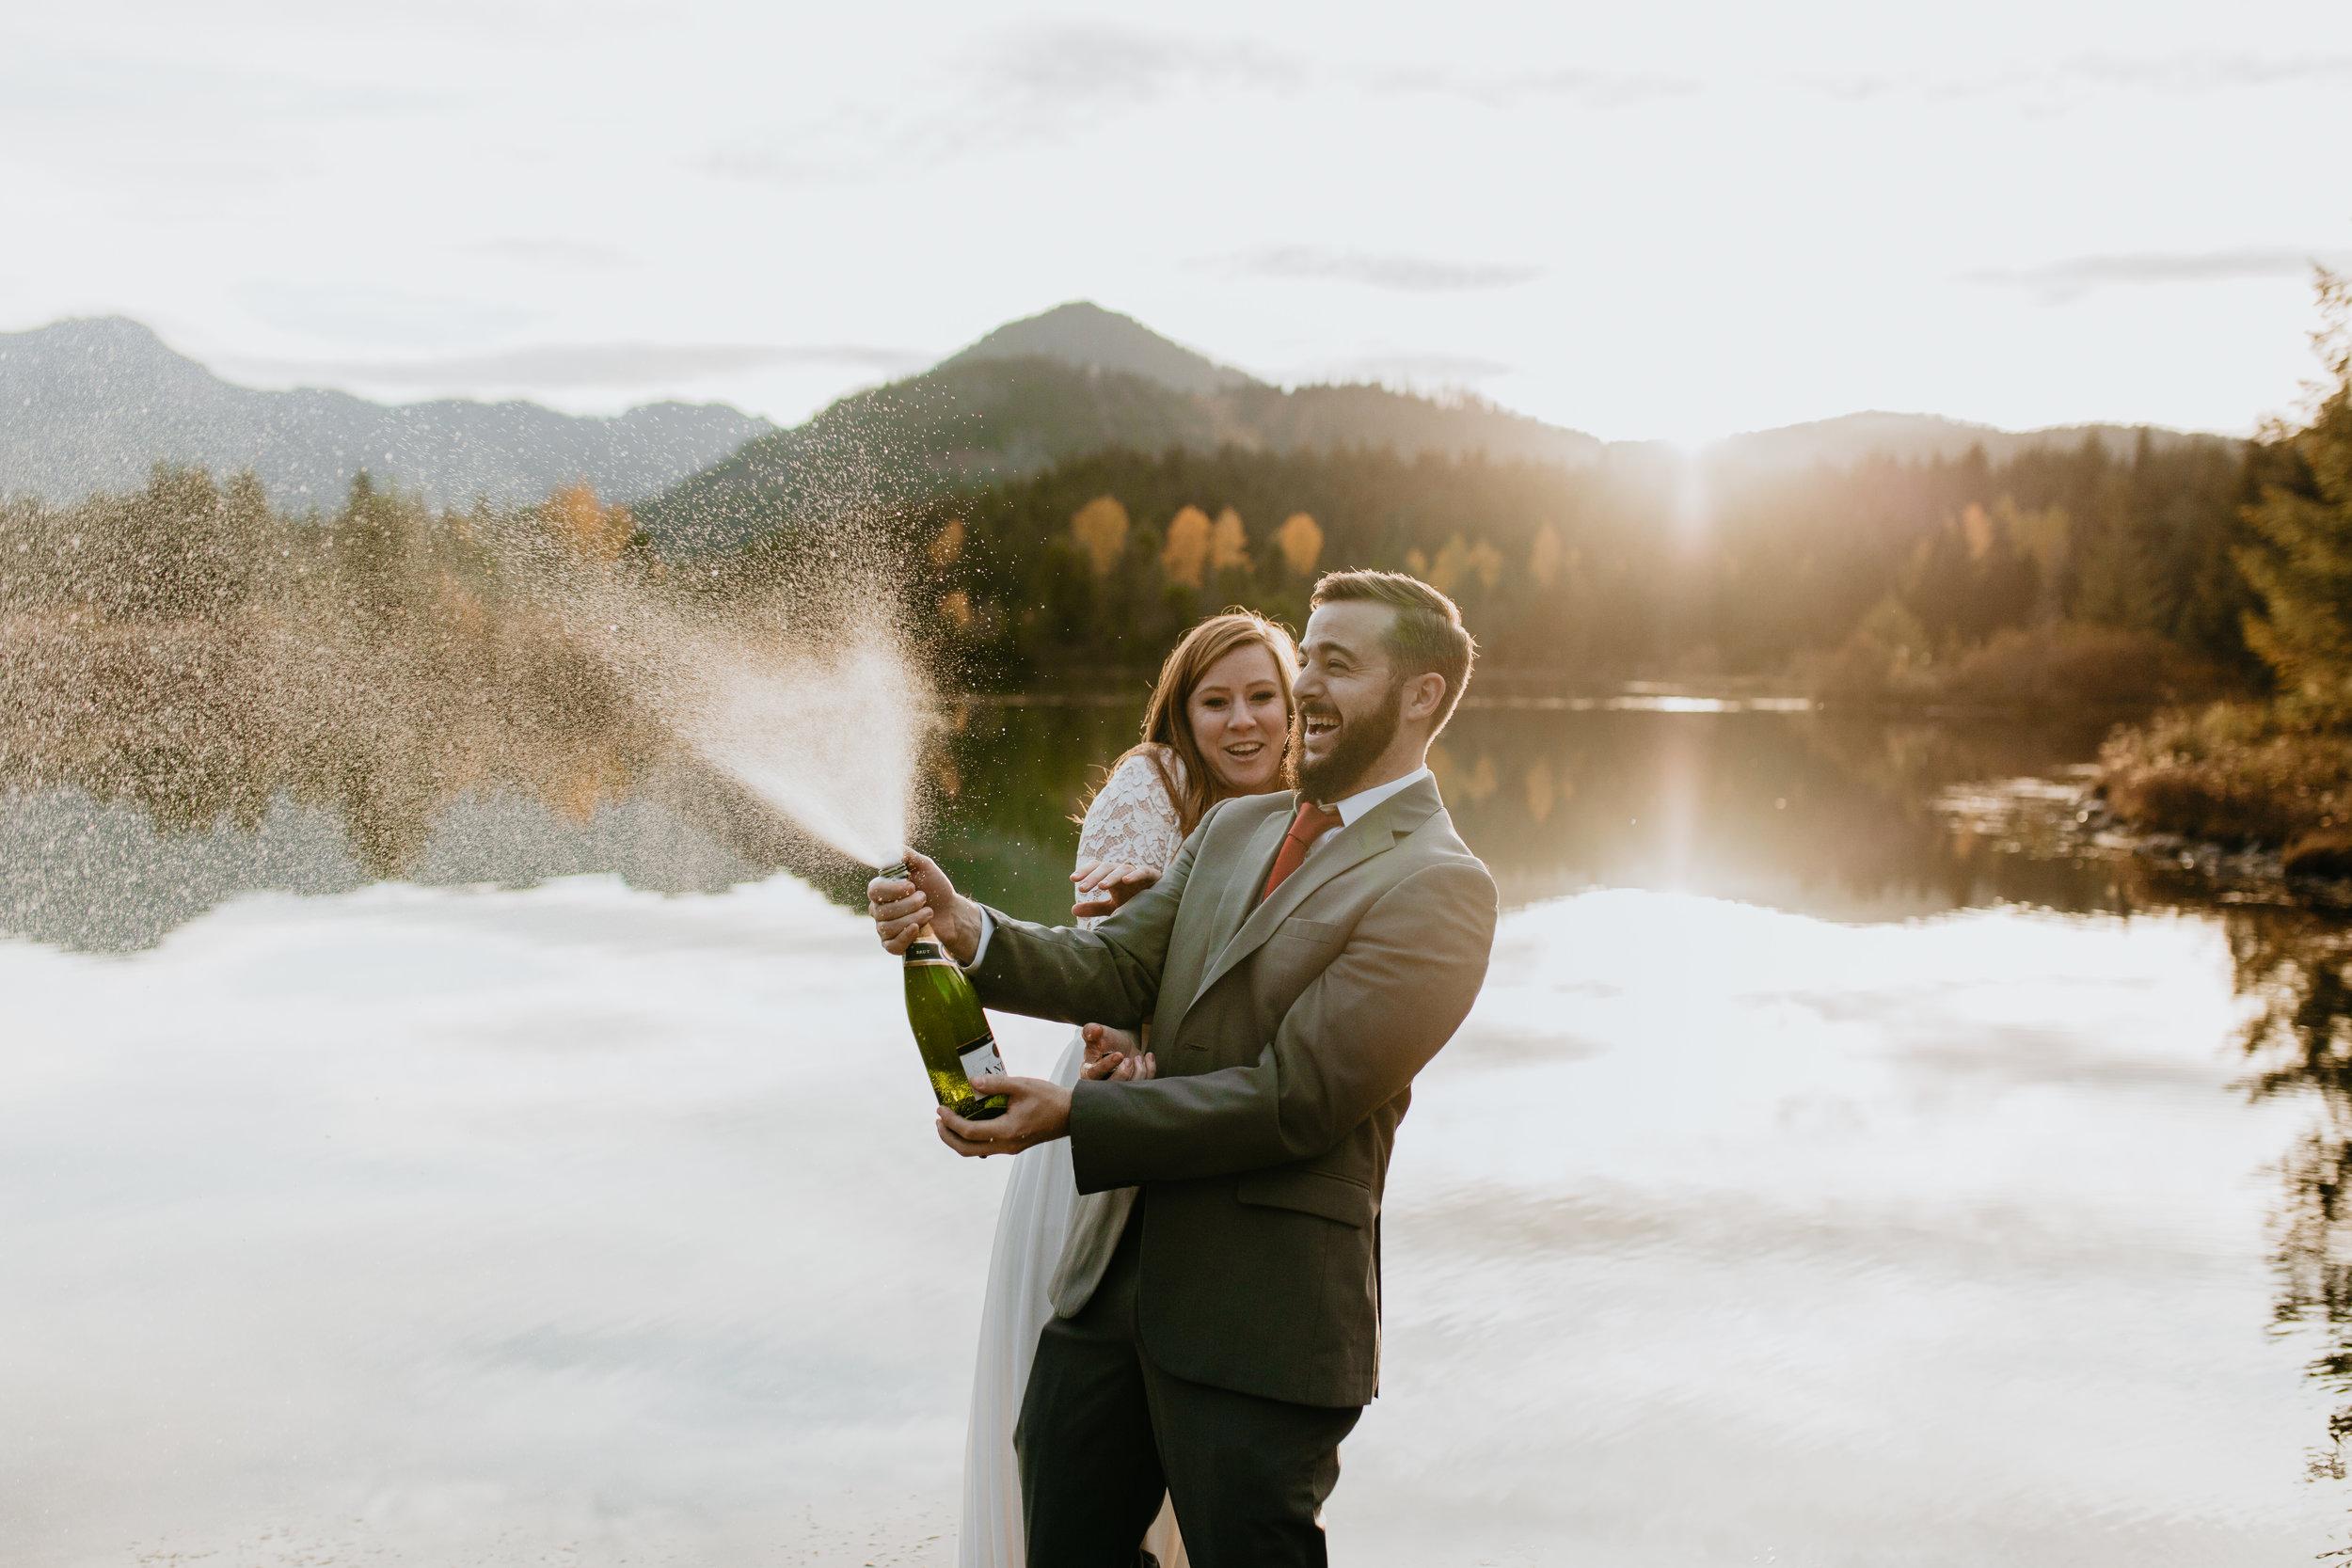 nicole-daacke-photography-mountain-view-elopement-at-gold-creek-pond-snoqualmie-washington-wa-elopement-photographer-photography-adventure-elopement-in-washington-fall-lakeside-golden-sunset-boho-fun-bride-0463.jpg